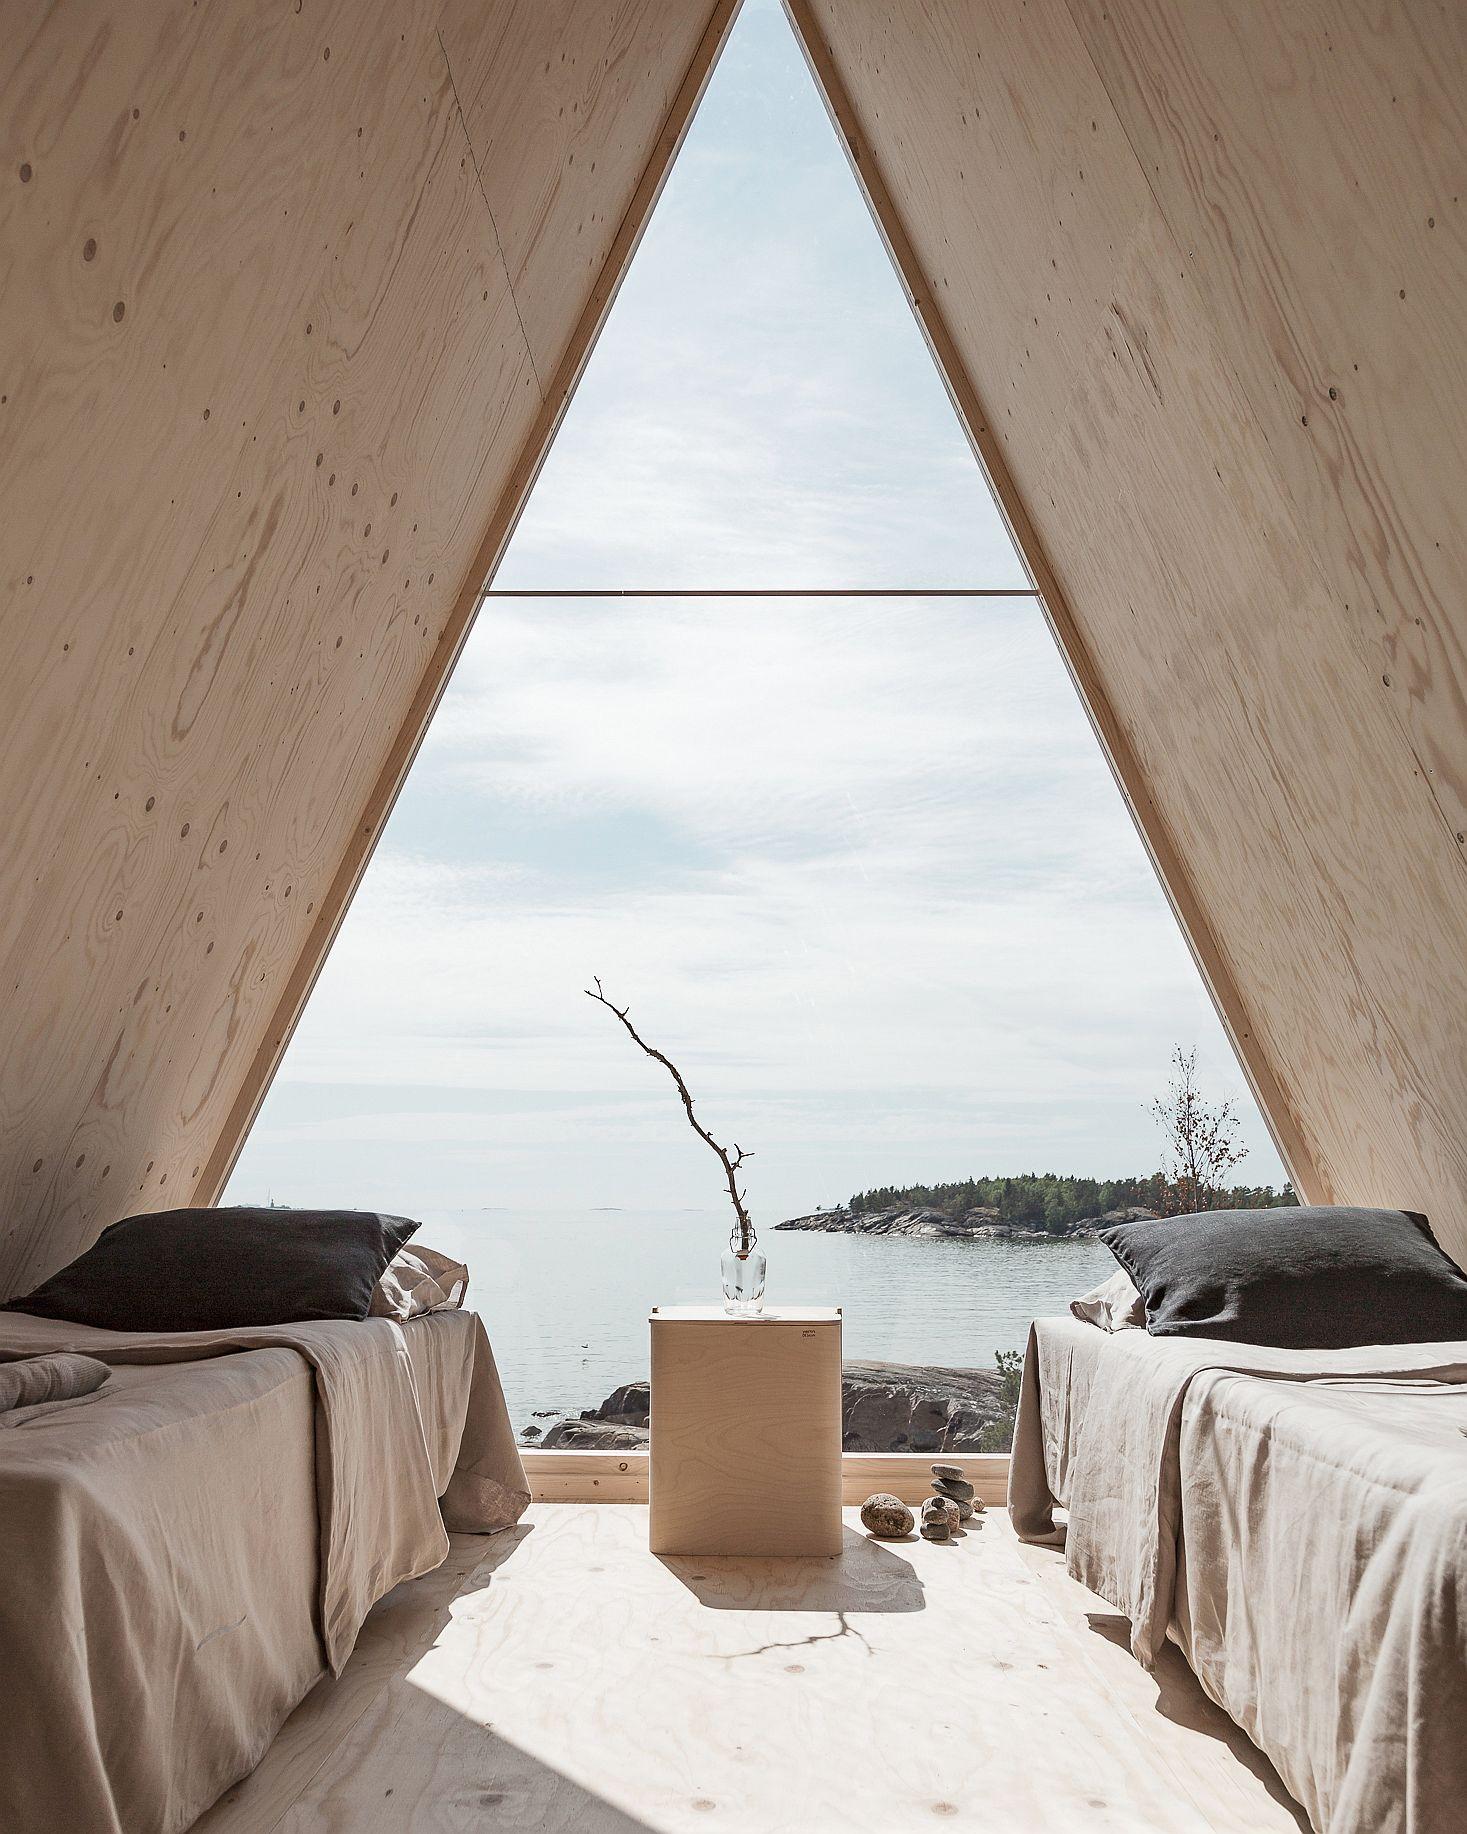 Simple sleeping arrangements inside the vabin